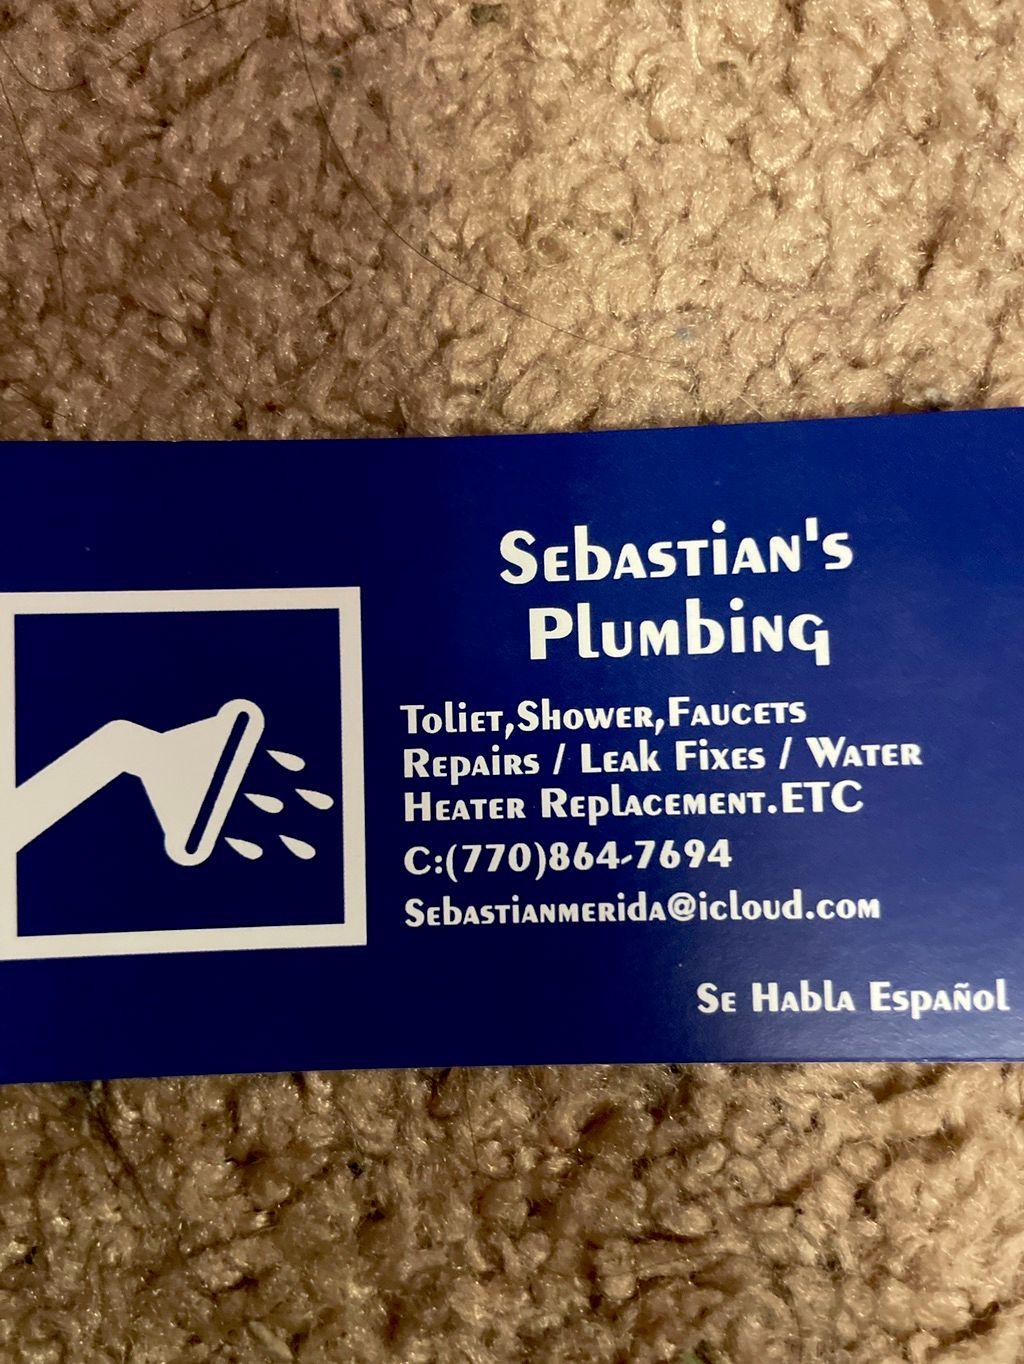 Sebastian's Plumbing